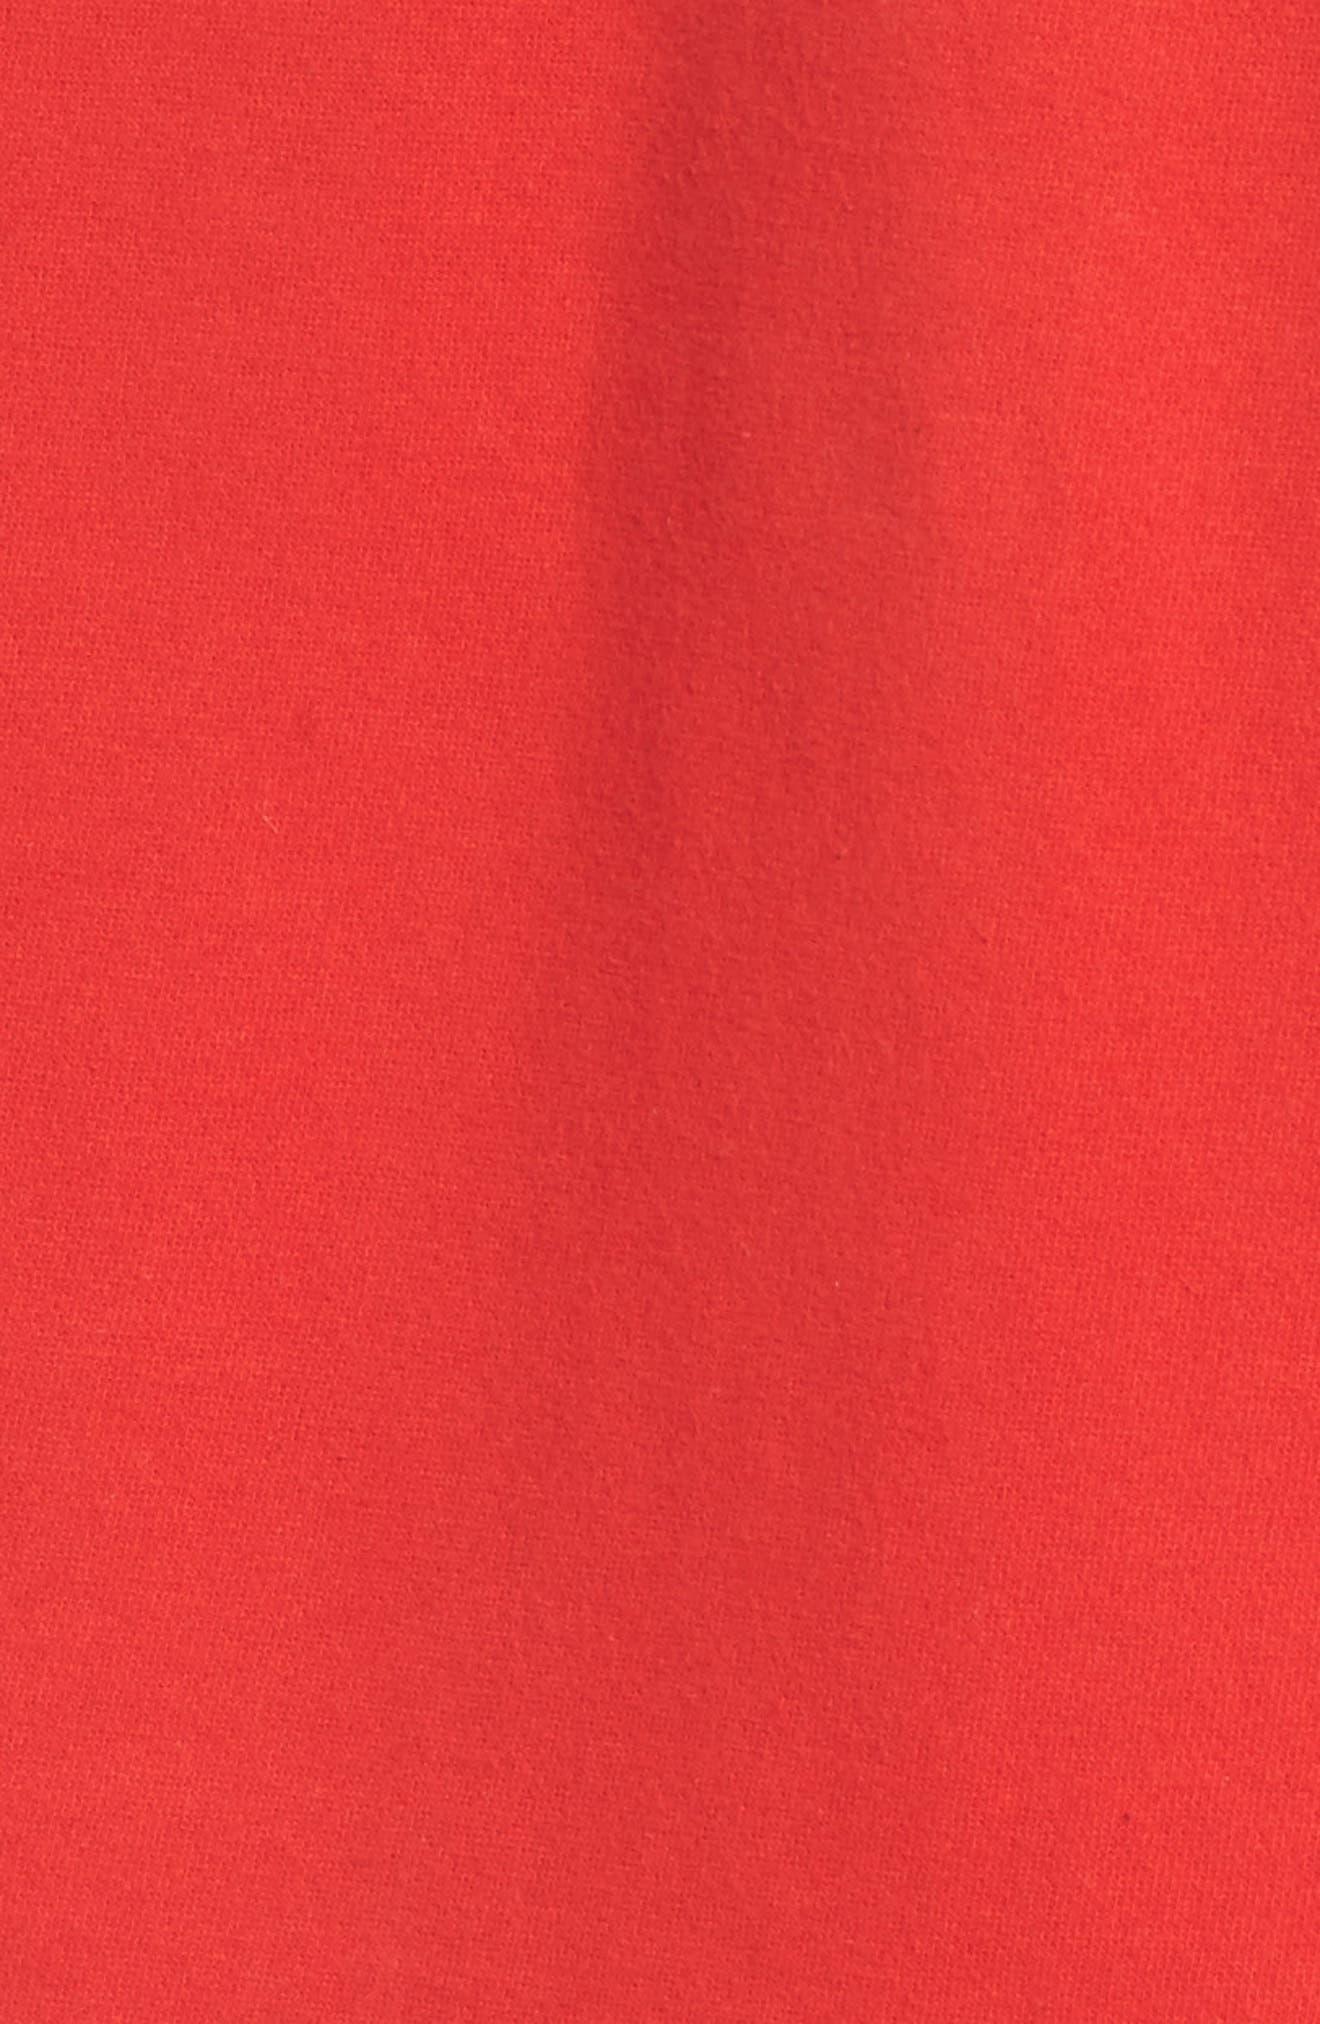 JUNK FOOD,                             Junkfood Disney<sup>®</sup> Classic Mickey Sweatshirt,                             Alternate thumbnail 5, color,                             600